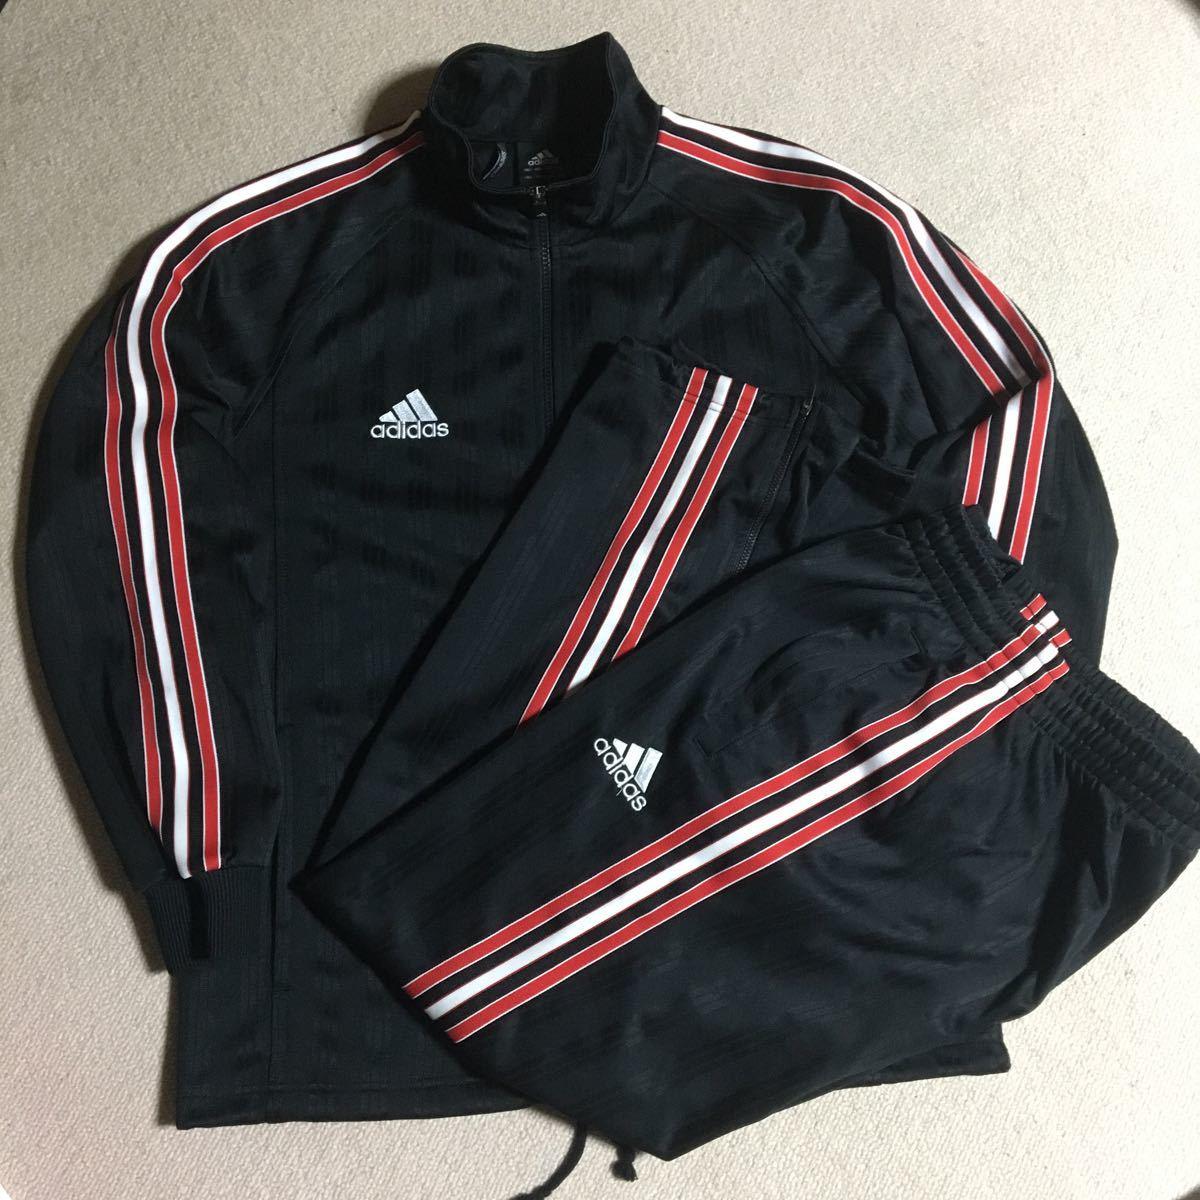 adidas アディダス / ジャージ ジャケット・パンツ 上・下セット / サイズ L / 黒×赤・黒・白ライン